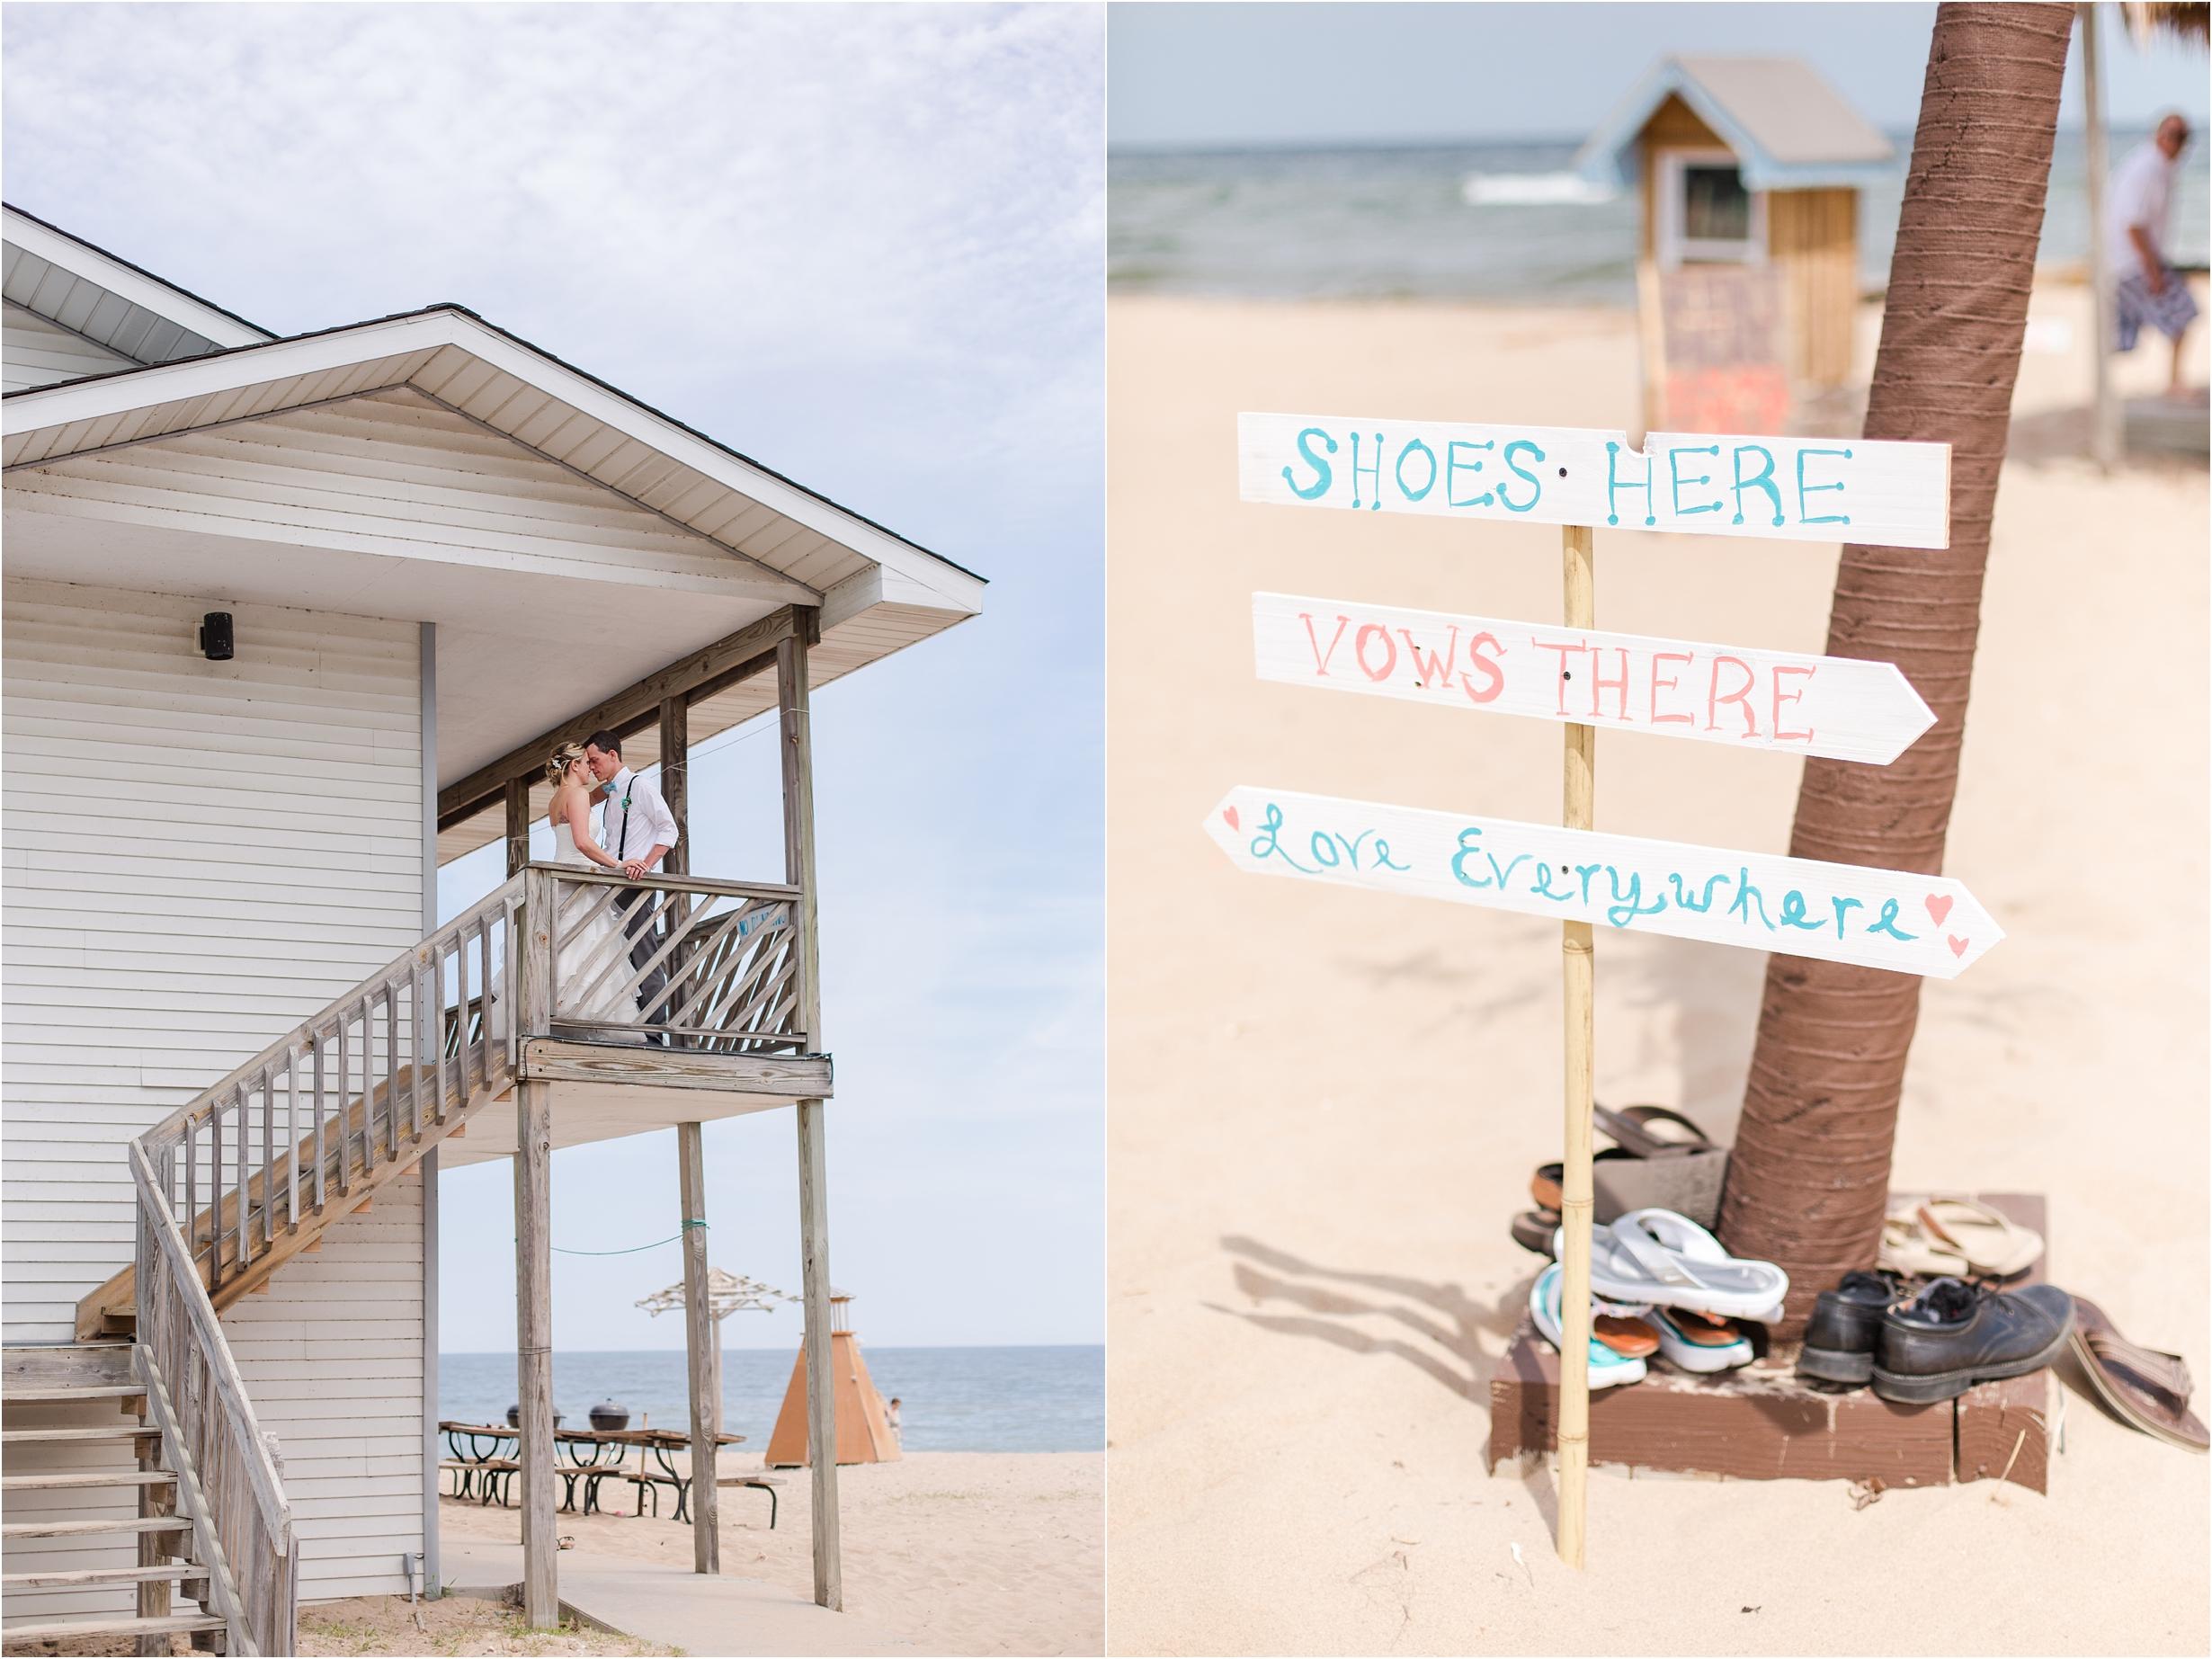 romantic-timeless-candid-wedding-photos-at-the-mai-tiki-resort-in-oscoda-mi-by-courtney-carolyn-photography_0004.jpg